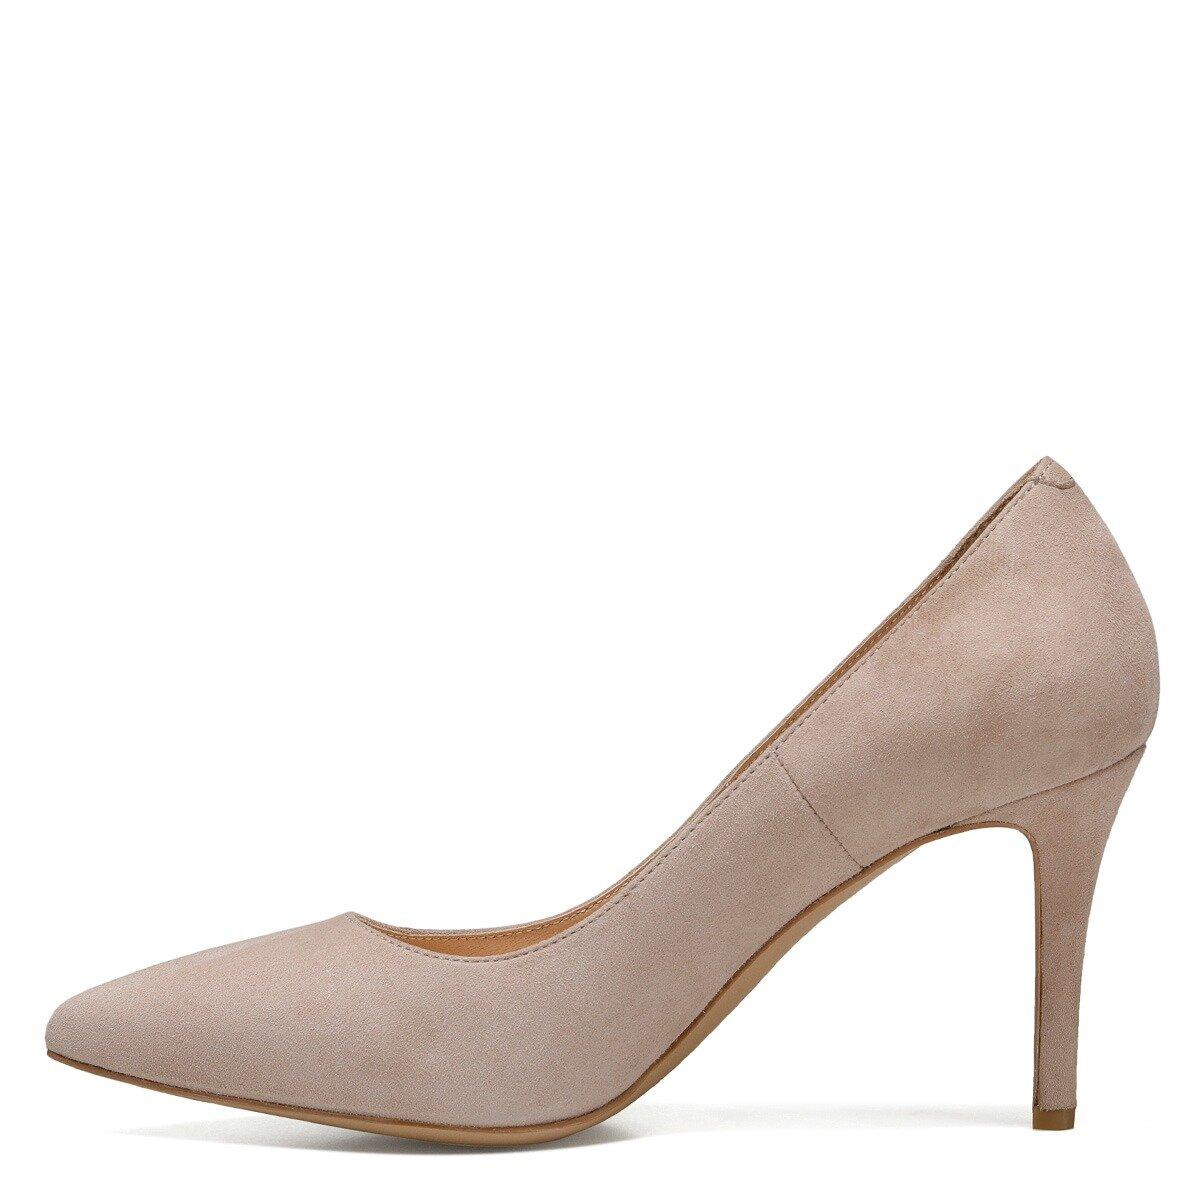 JACKIE Vizon Kadın Topuklu Ayakkabı